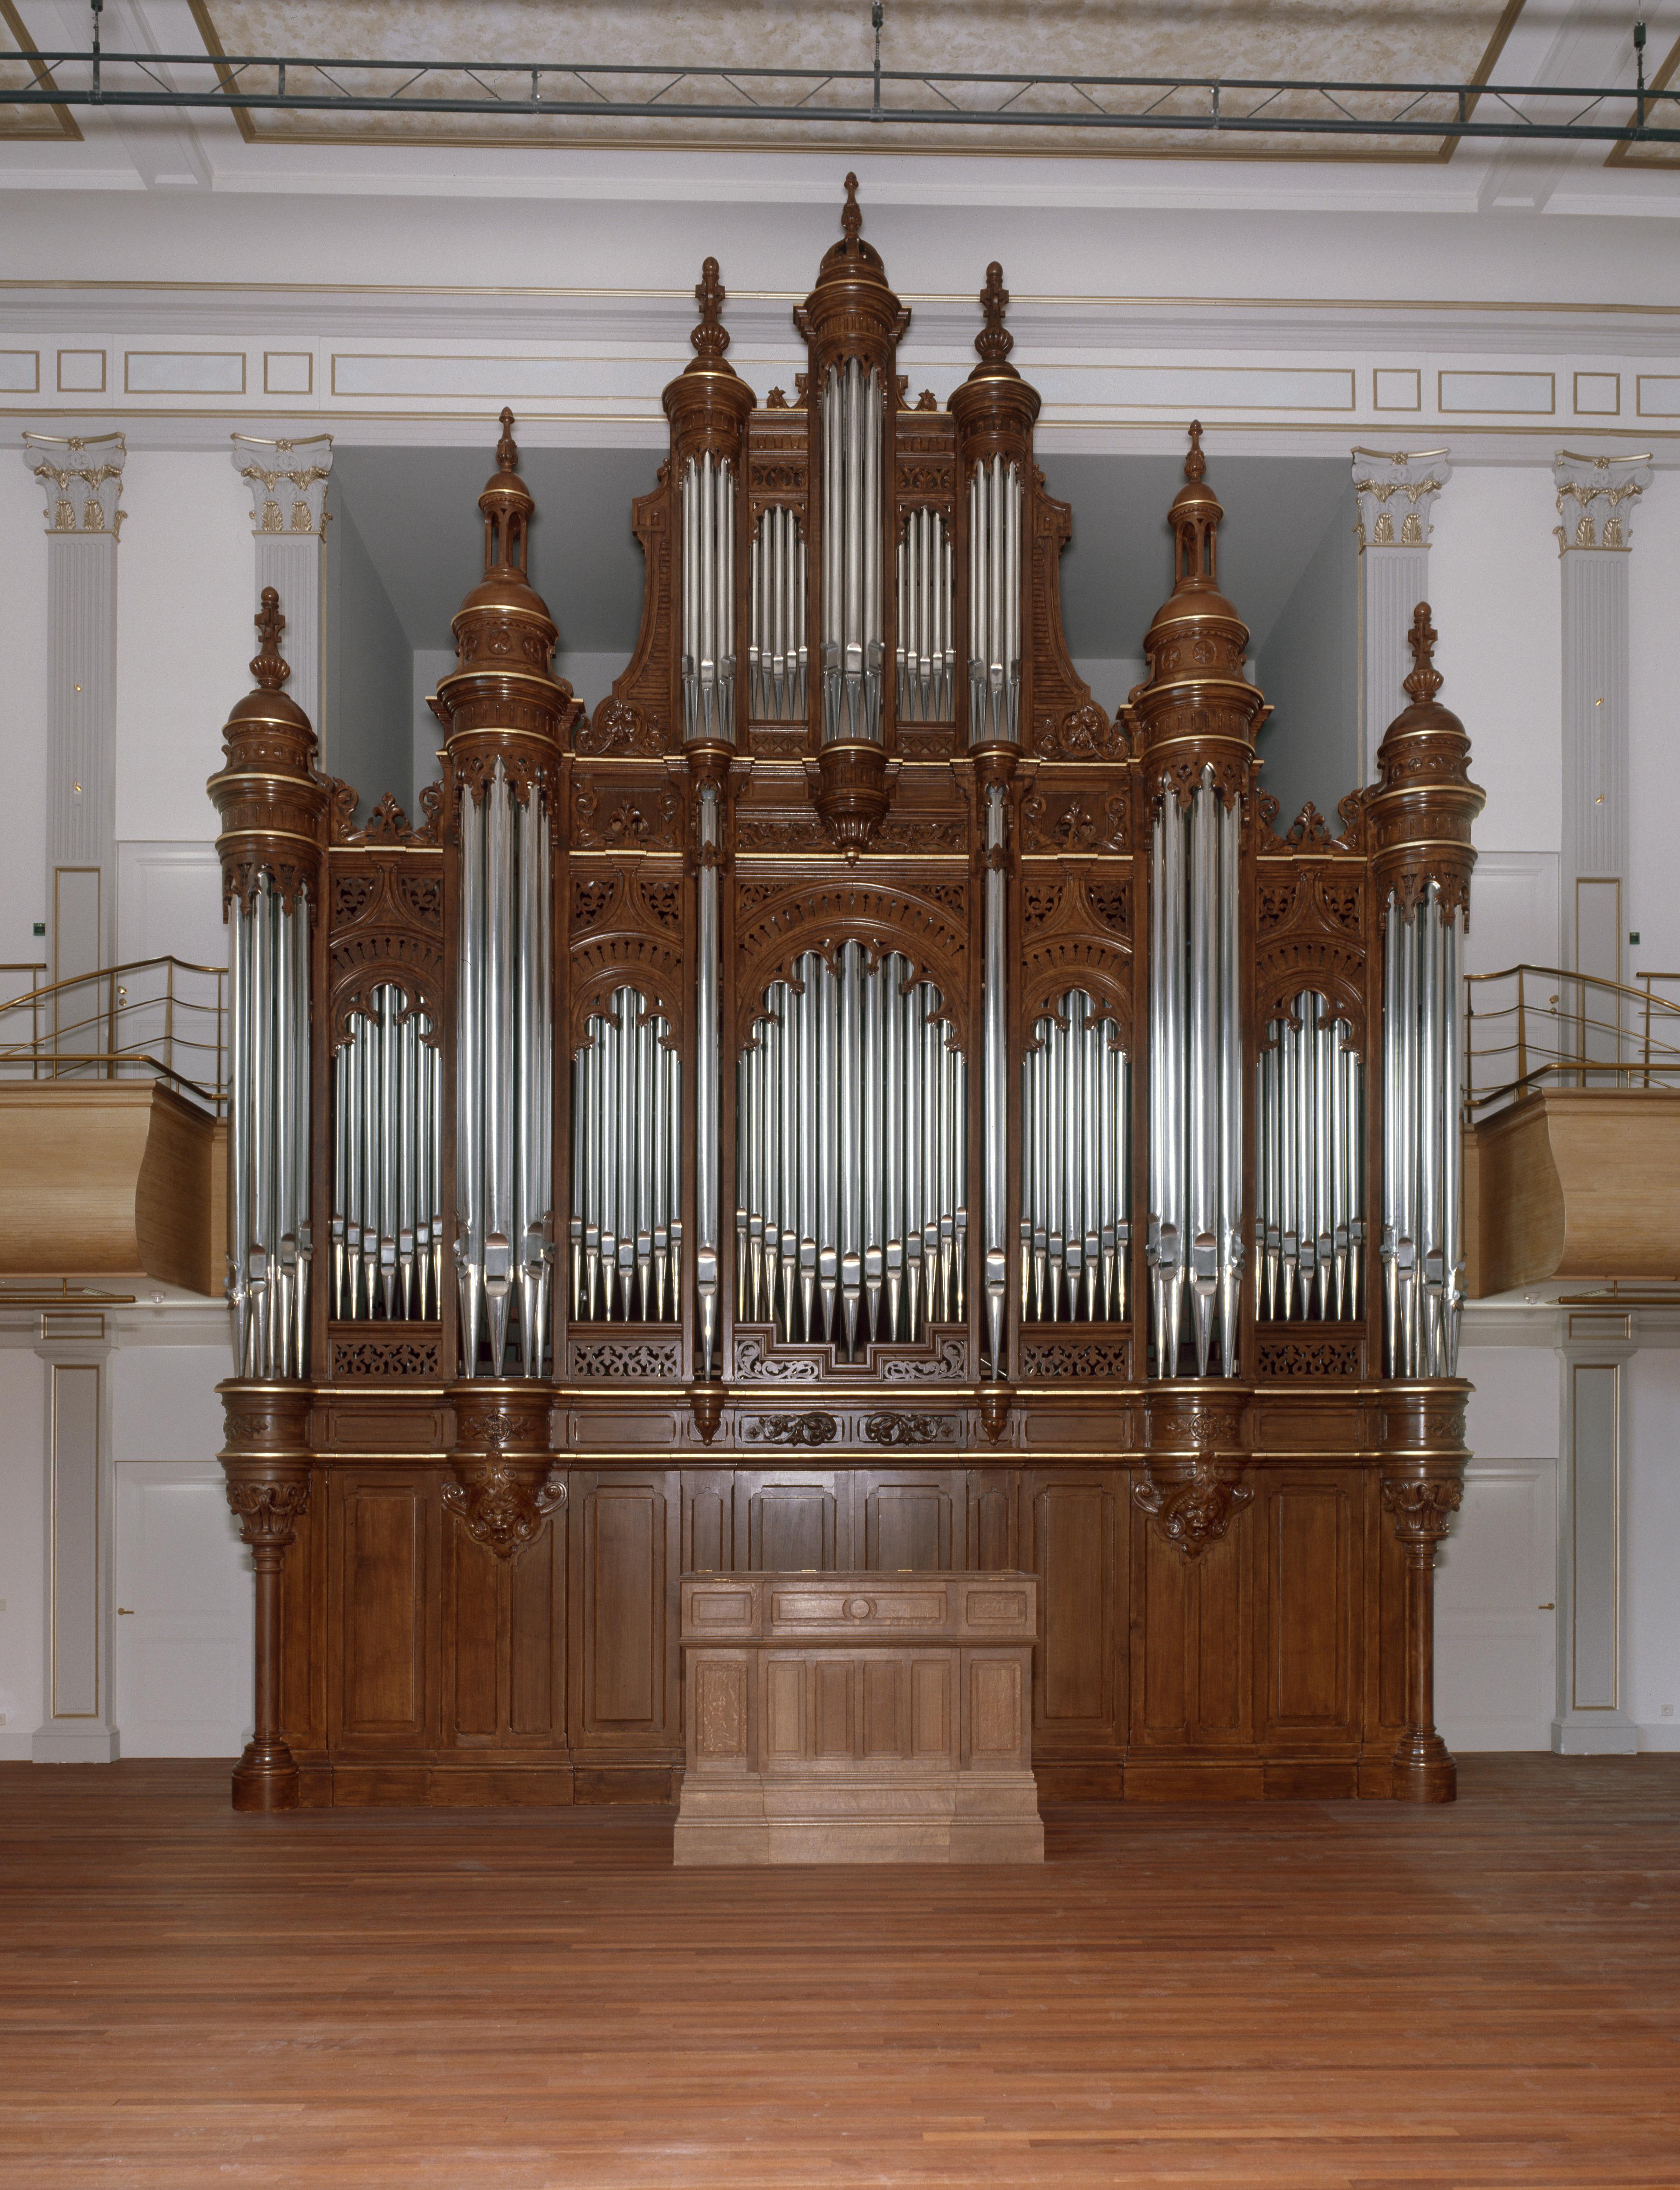 Orgel van de philharmonie haarlem wikipedia for Amsterdam b b centro